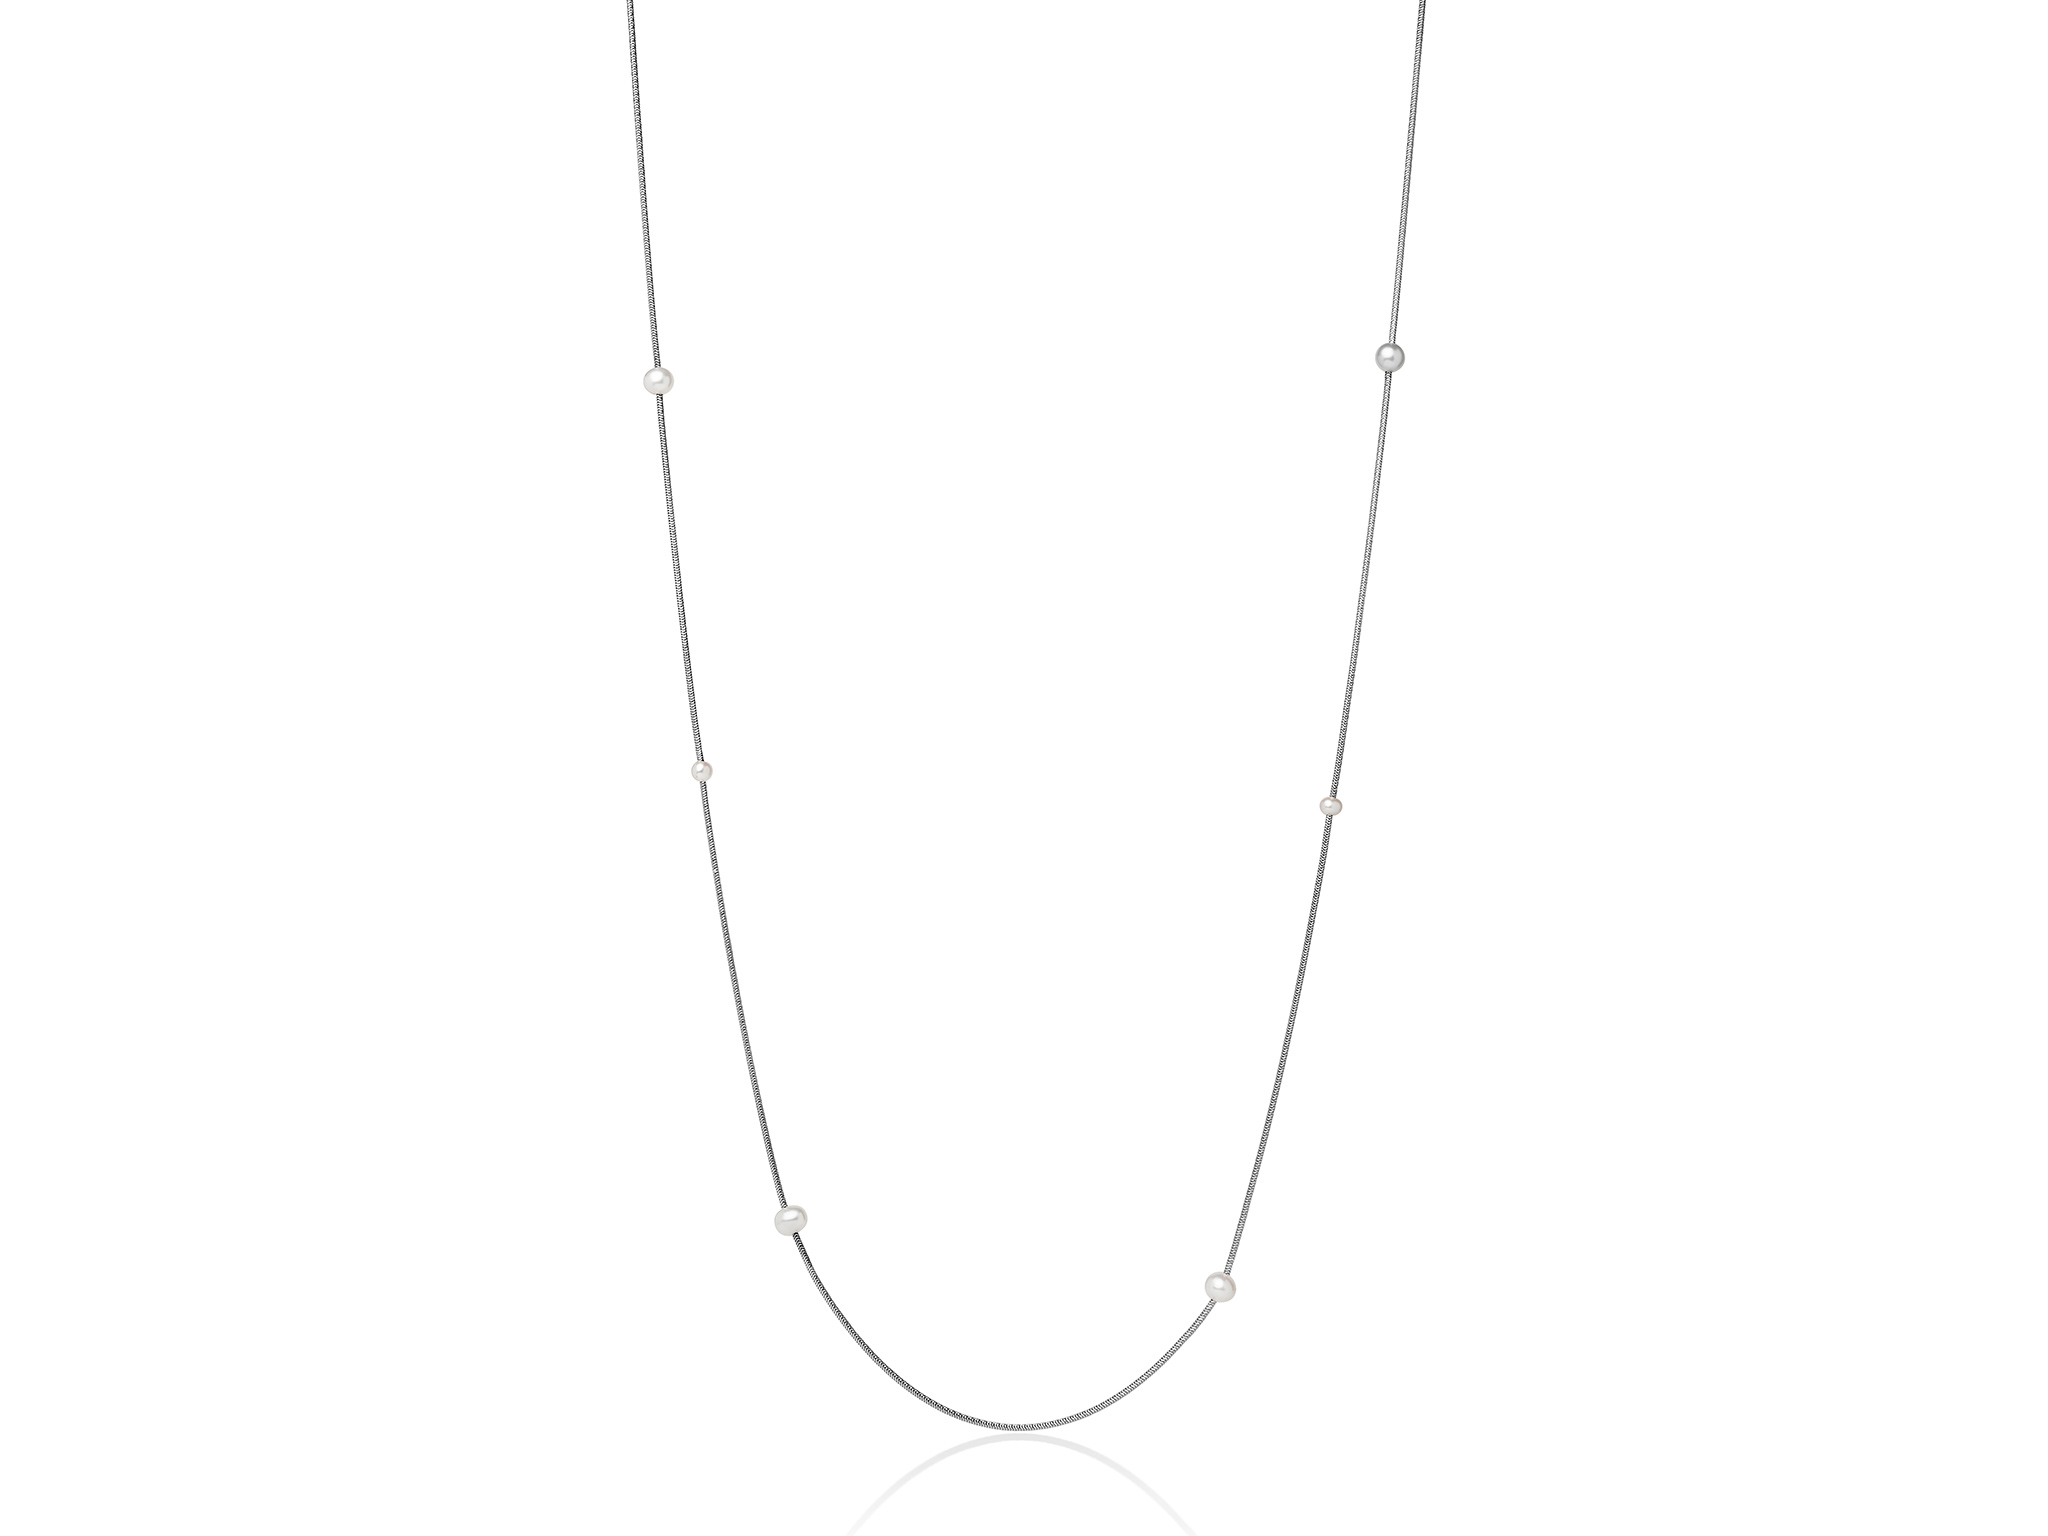 Collana lunga in argento con perle. - PCL5630